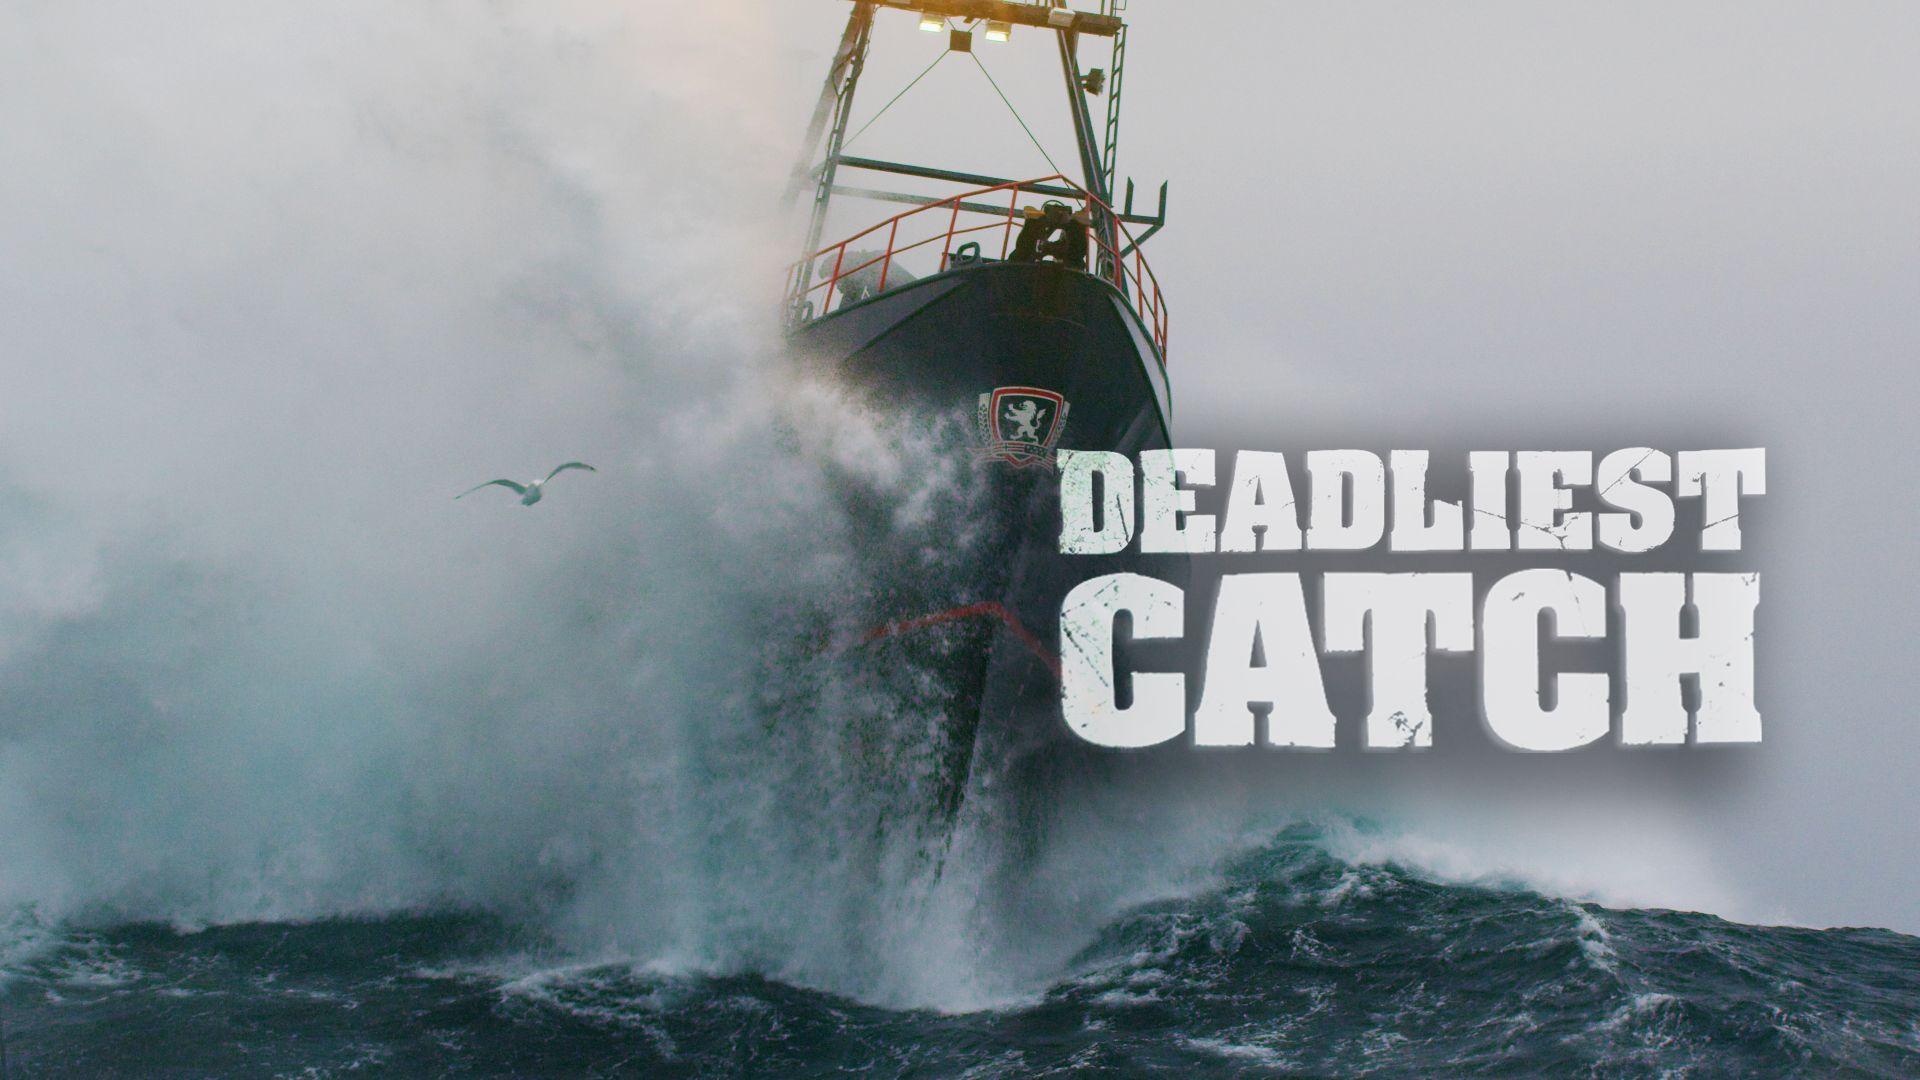 Discovery+: Deadliest Catch TV Show